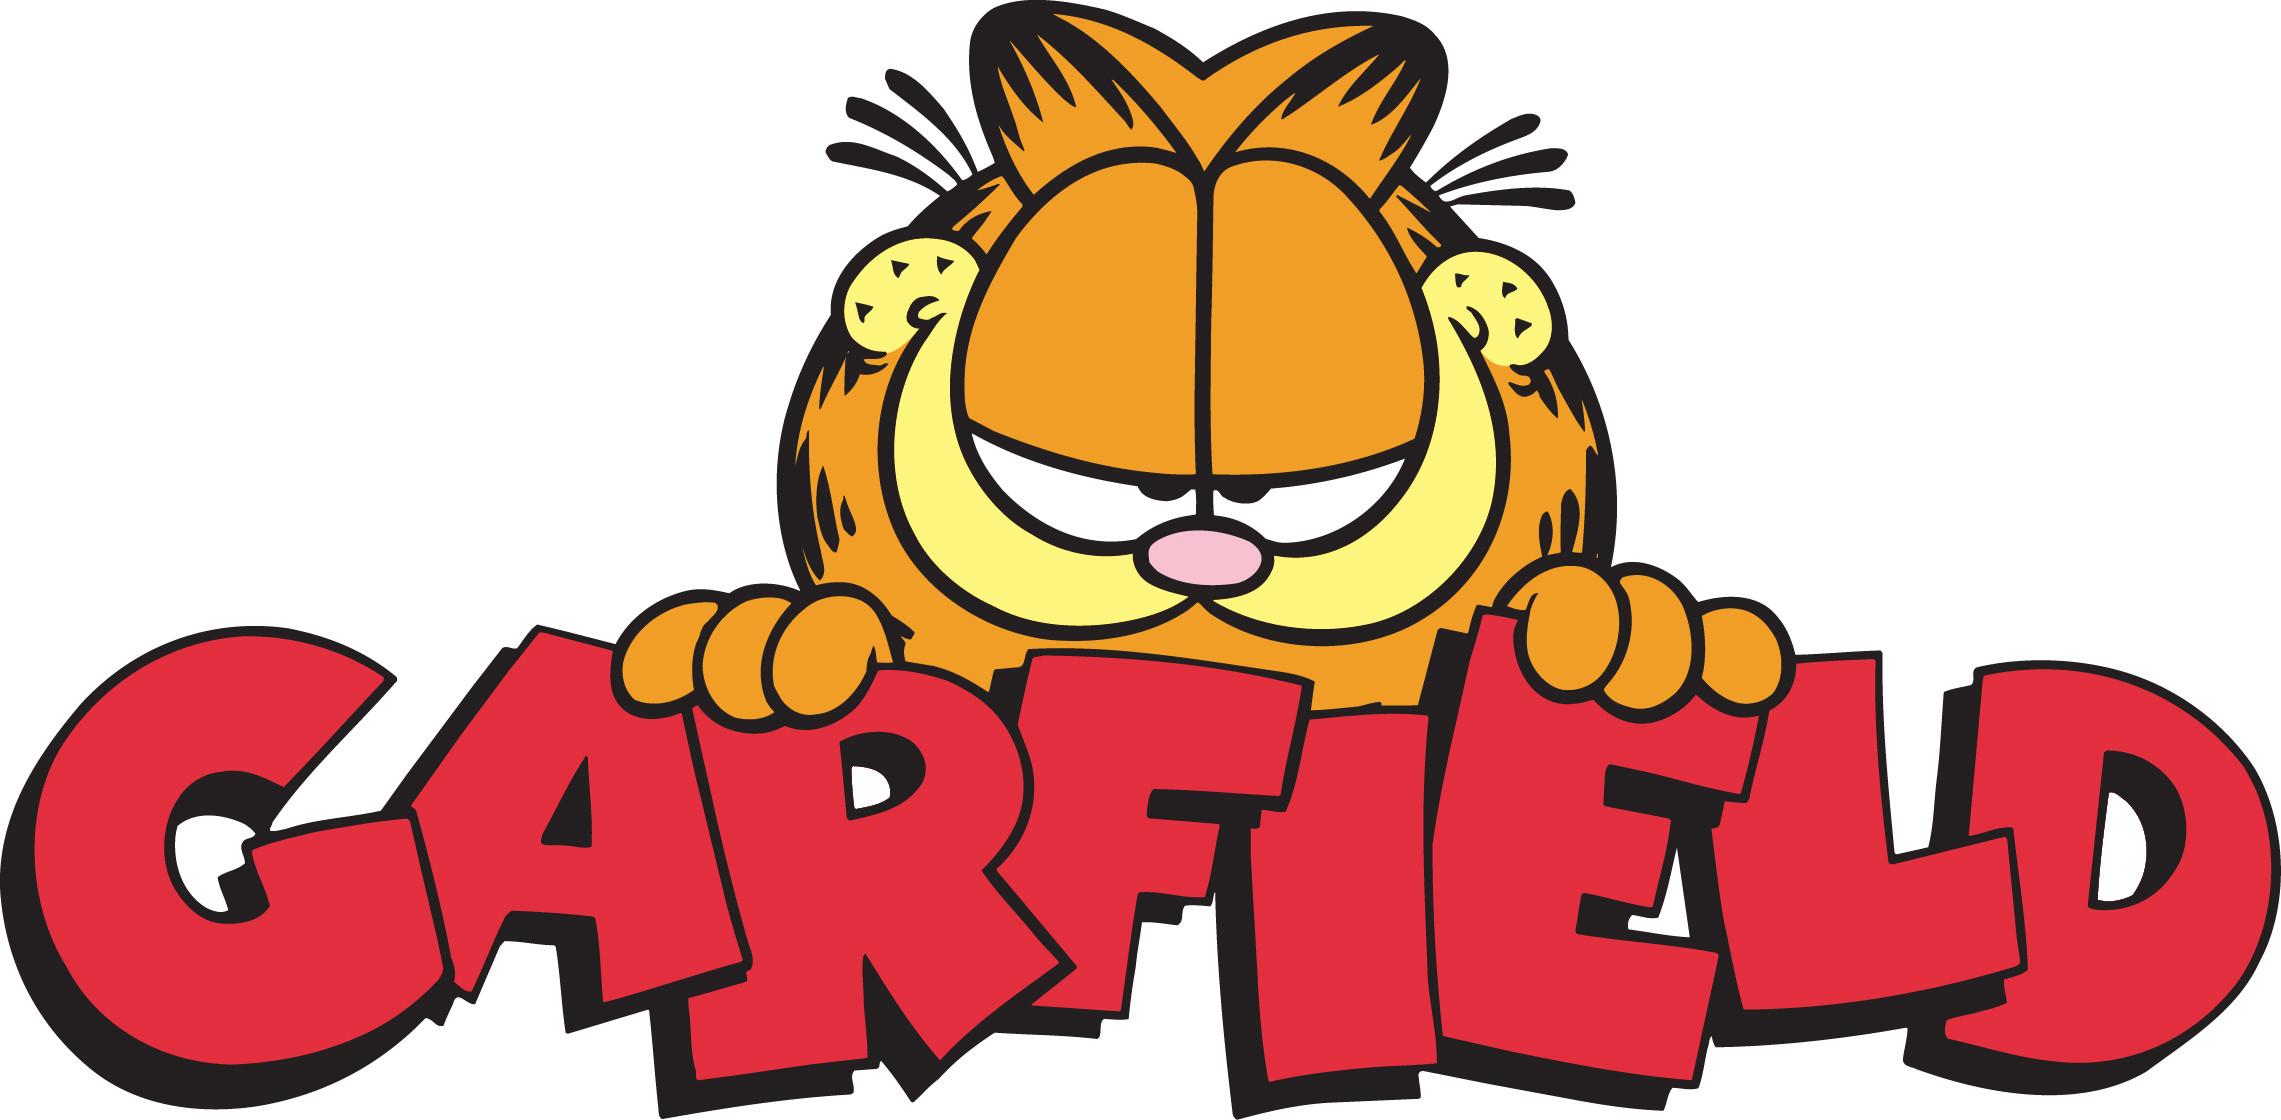 Garfield Wallpaper (58+ images)